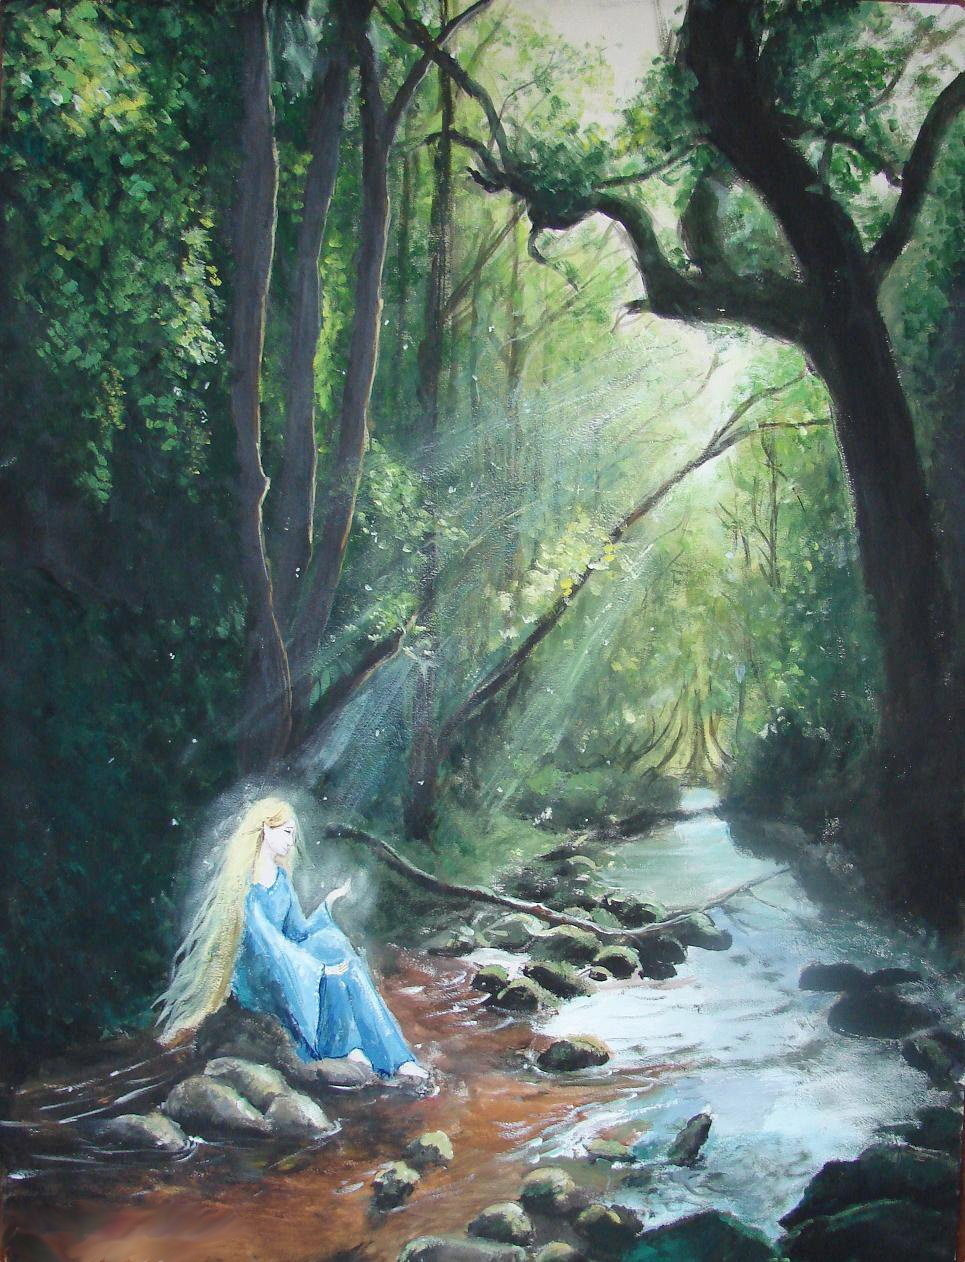 Lady of Lorien by Ninquelen